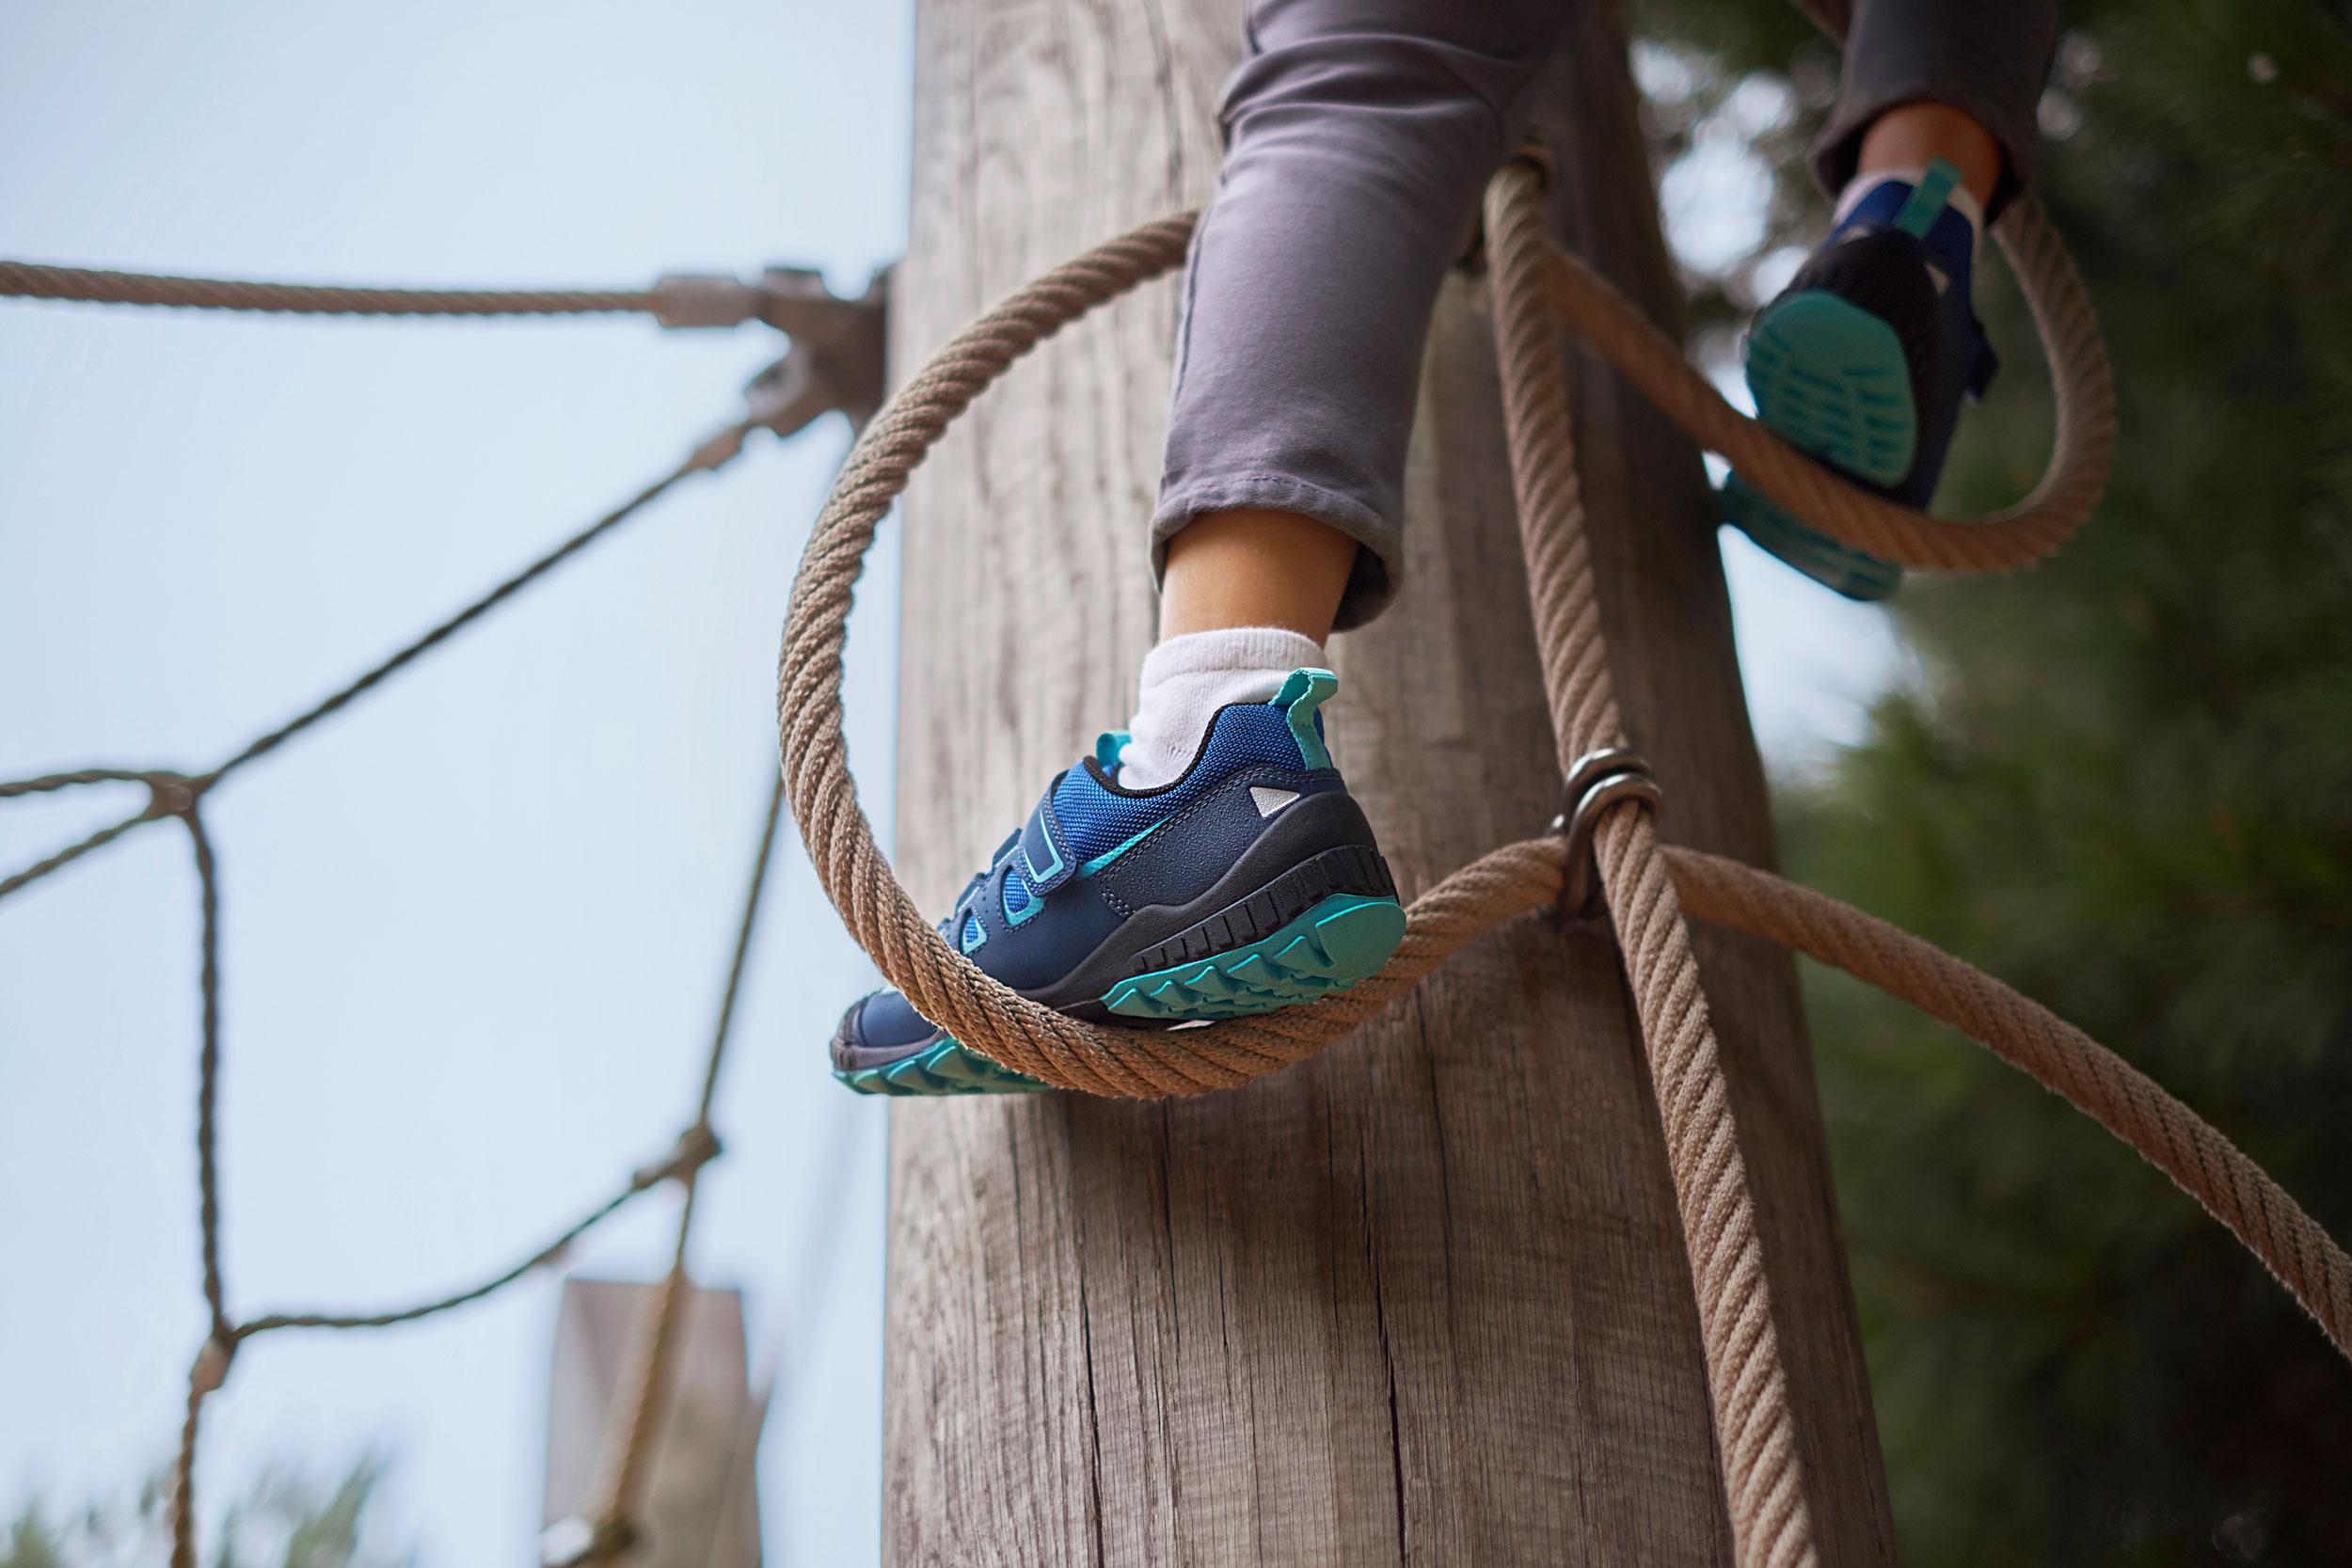 Start-rite-shoes-Fiona-Burrage-norwich-photographer-climbing.jpg